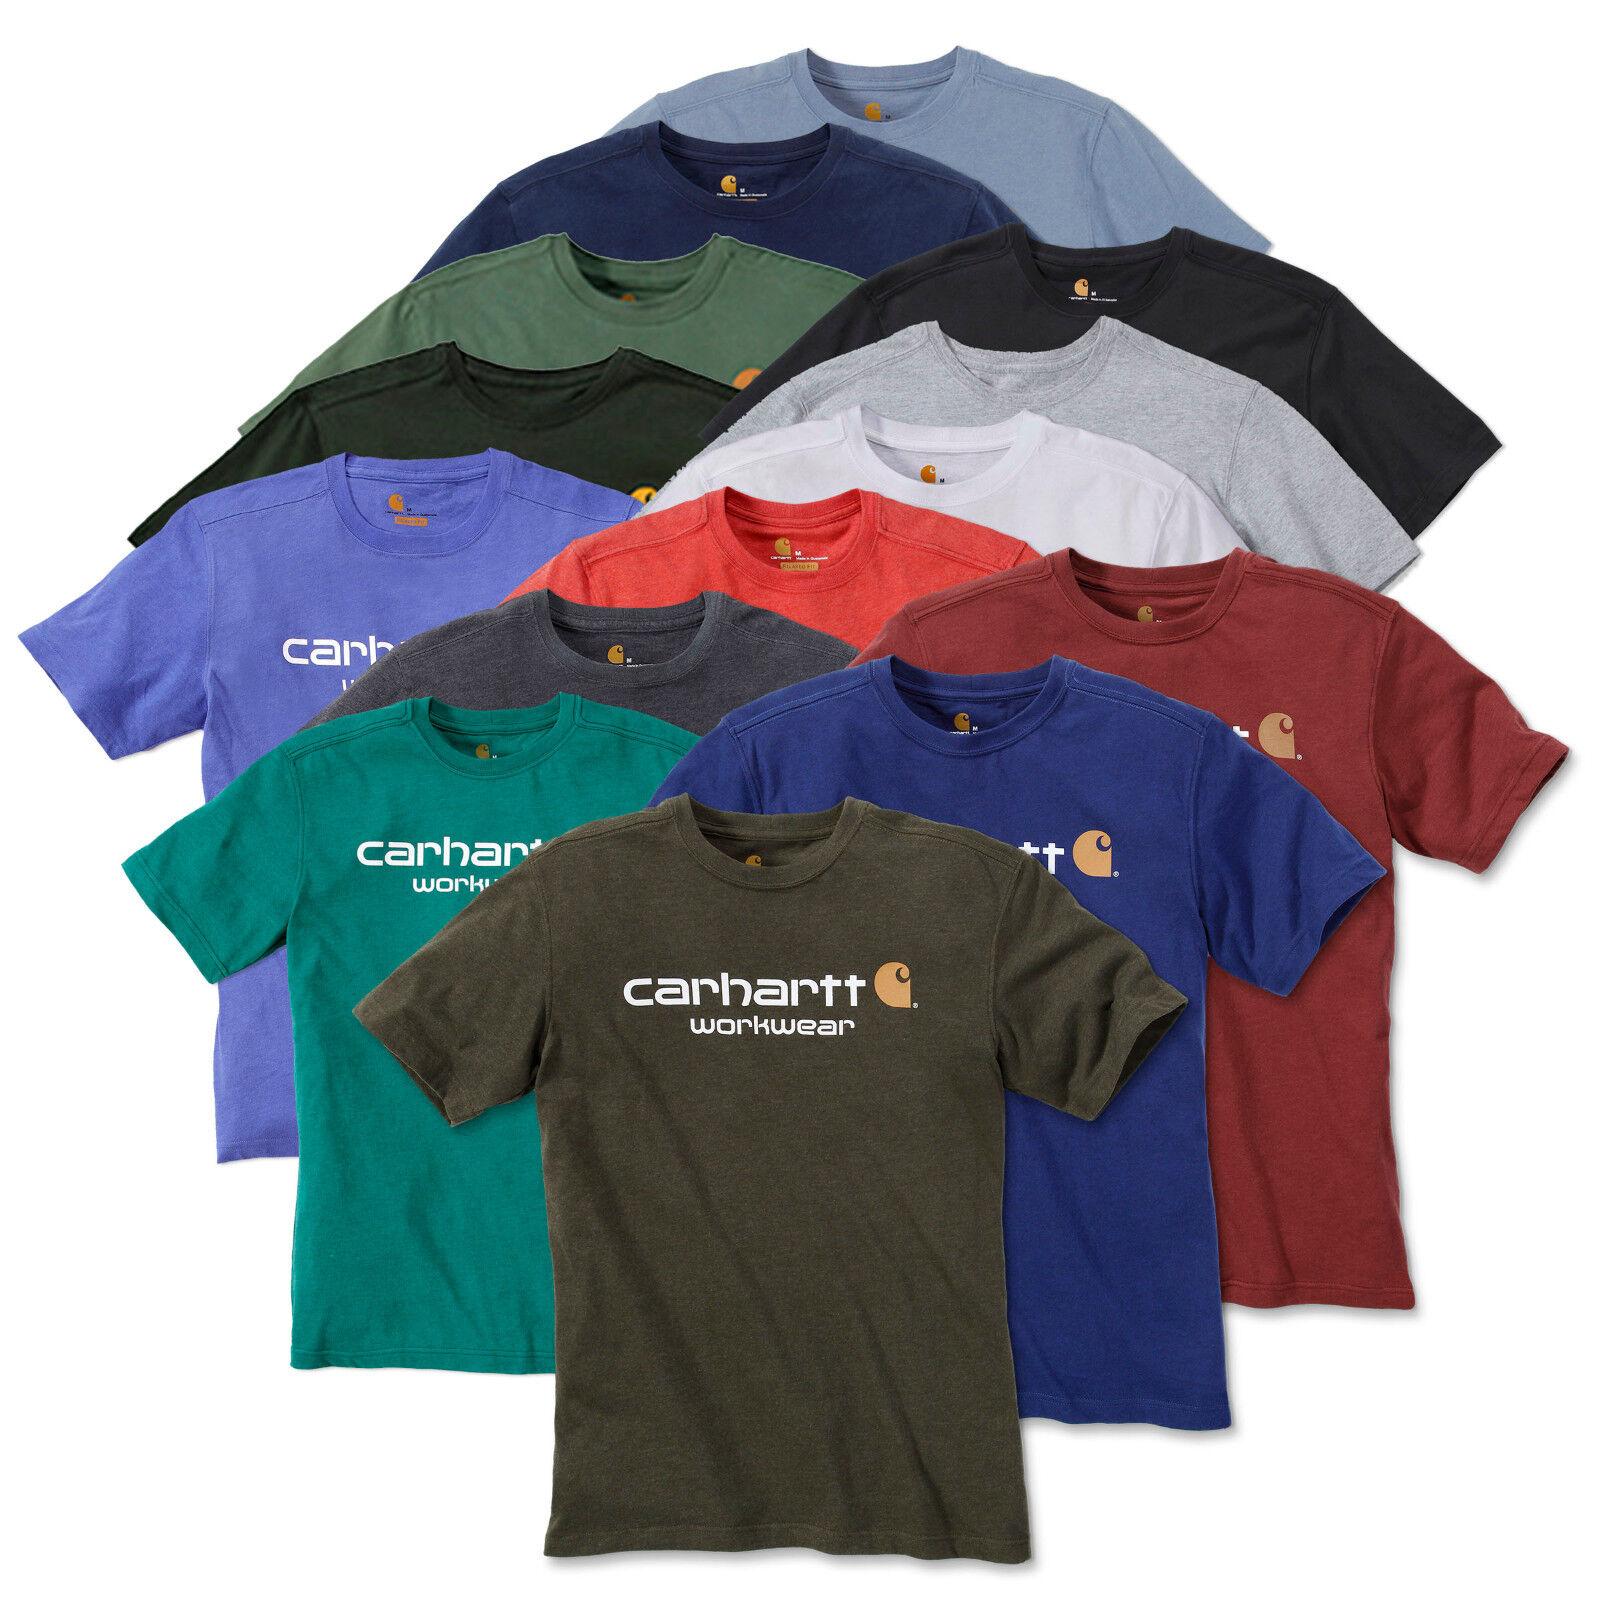 Carhartt Core Logo Short Sleeve T-Shirt | 13 colors | workwear | 101214 |